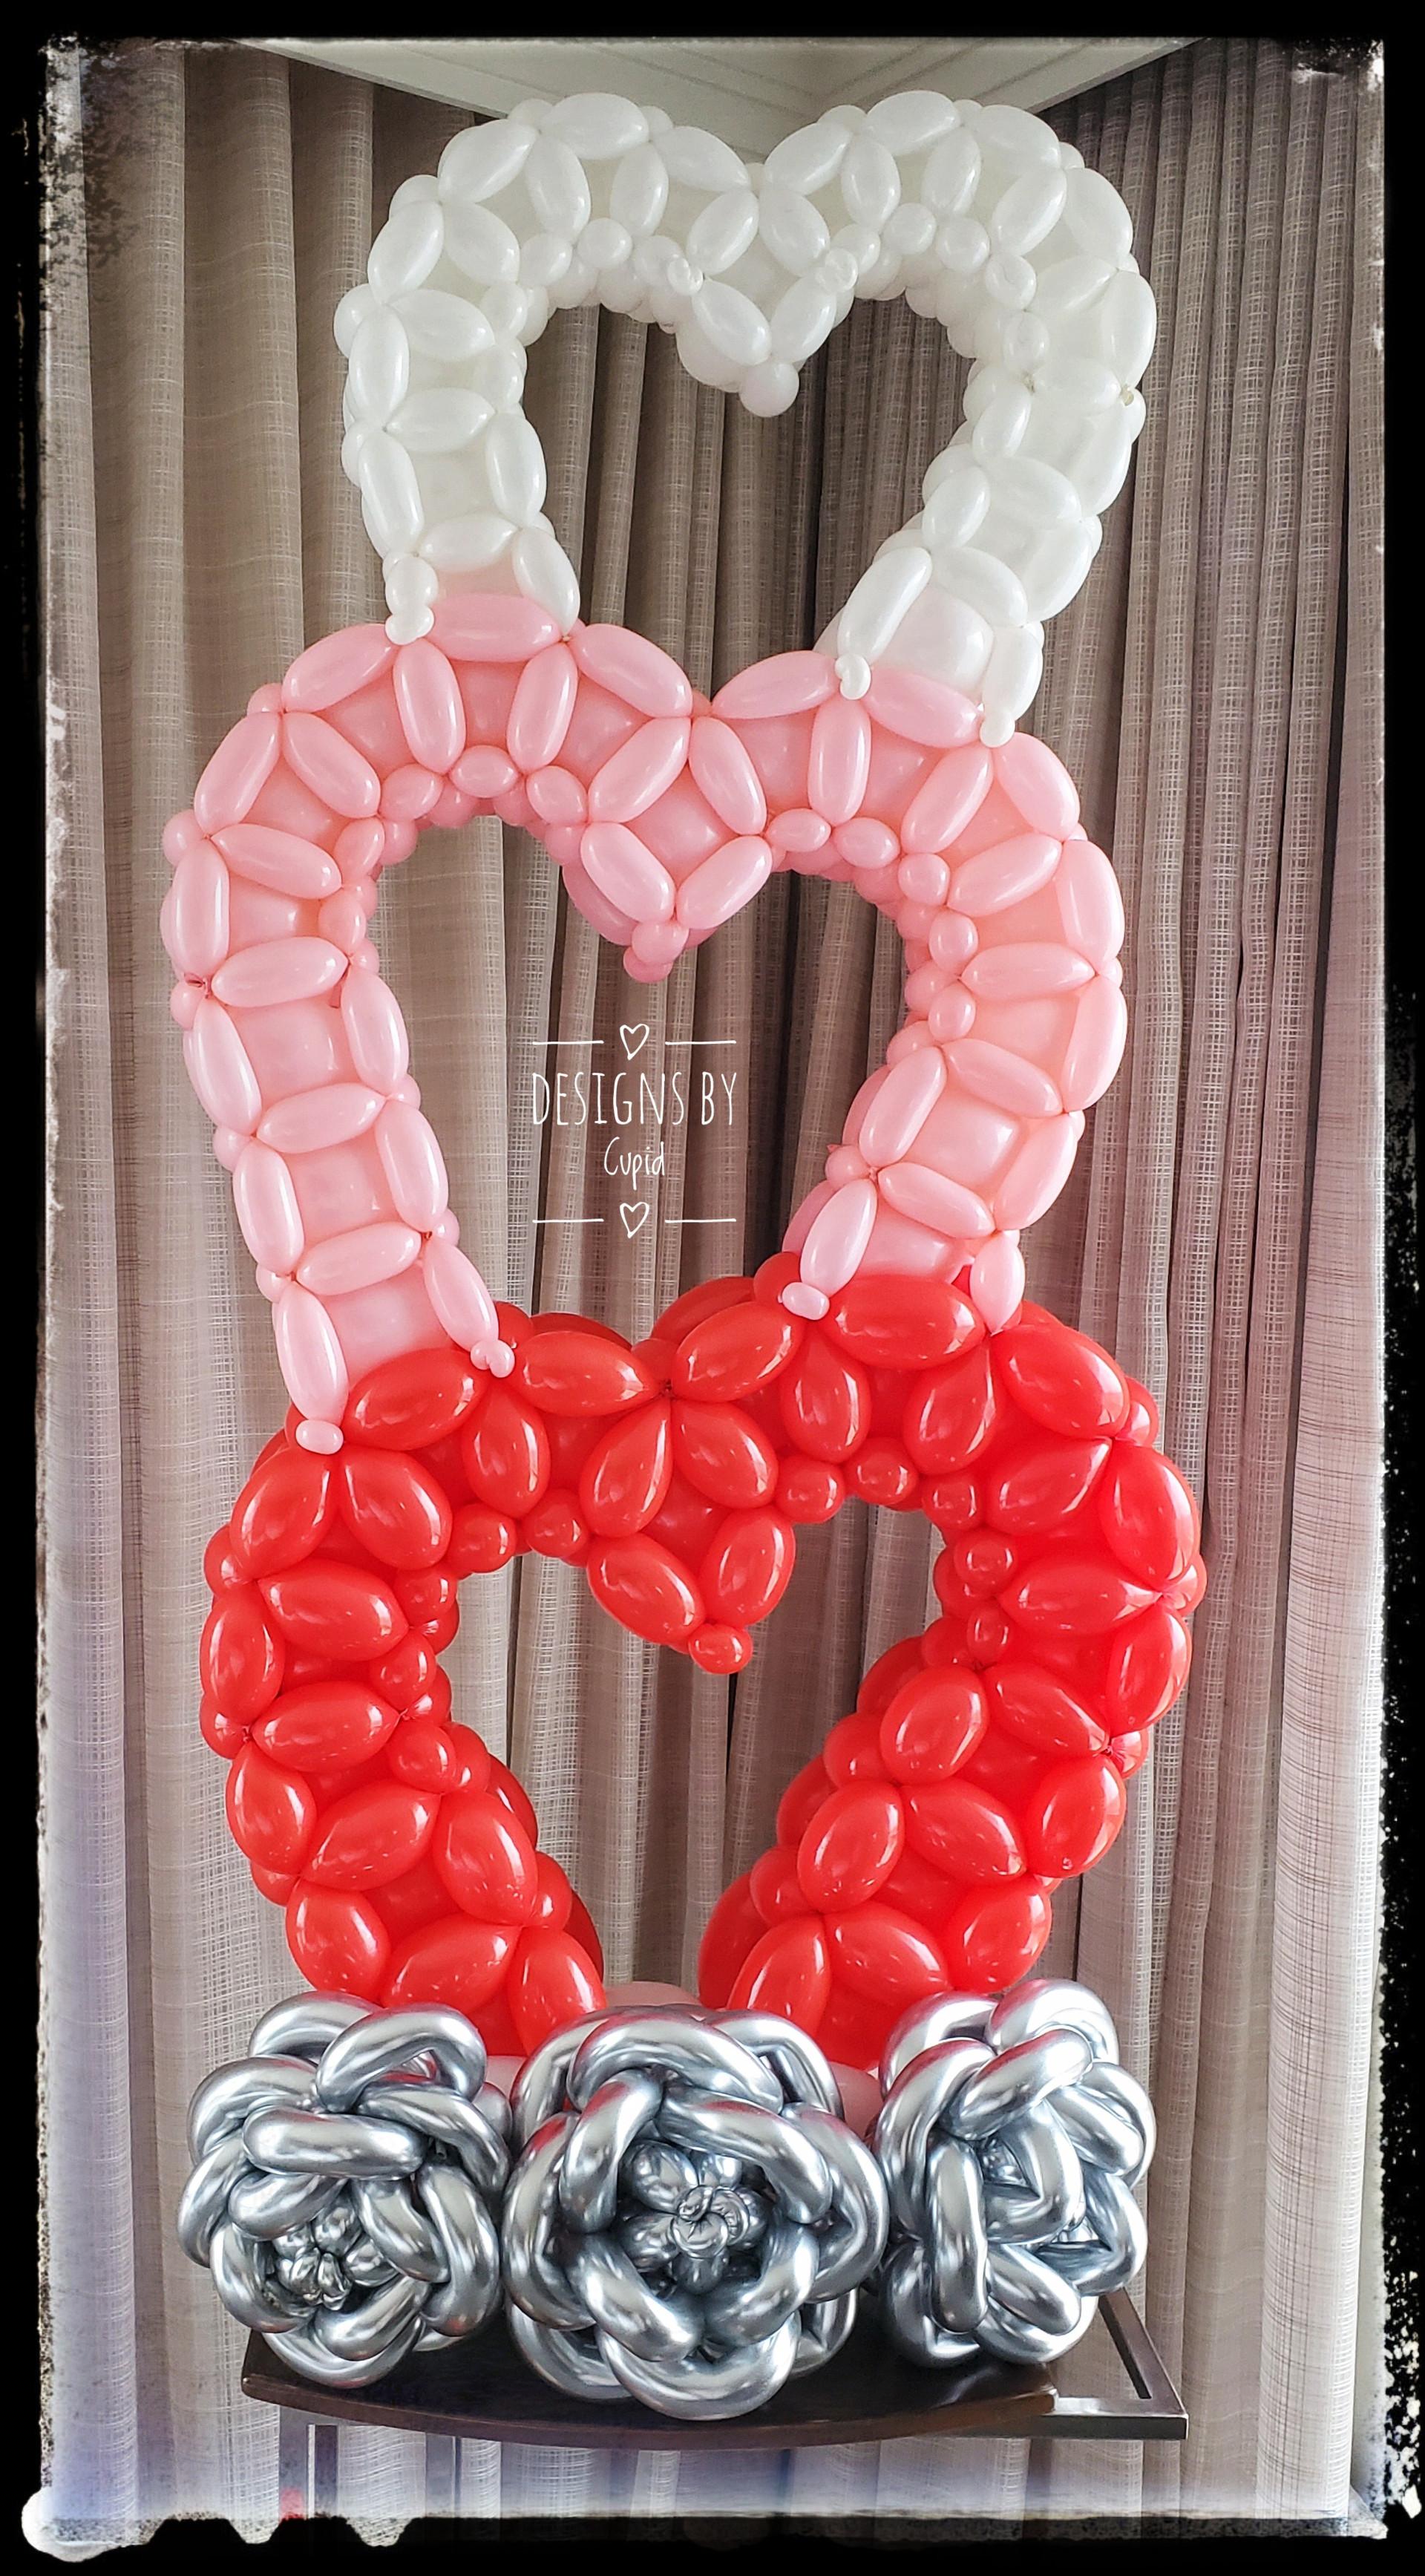 Triple Heart Balloon Sculpture